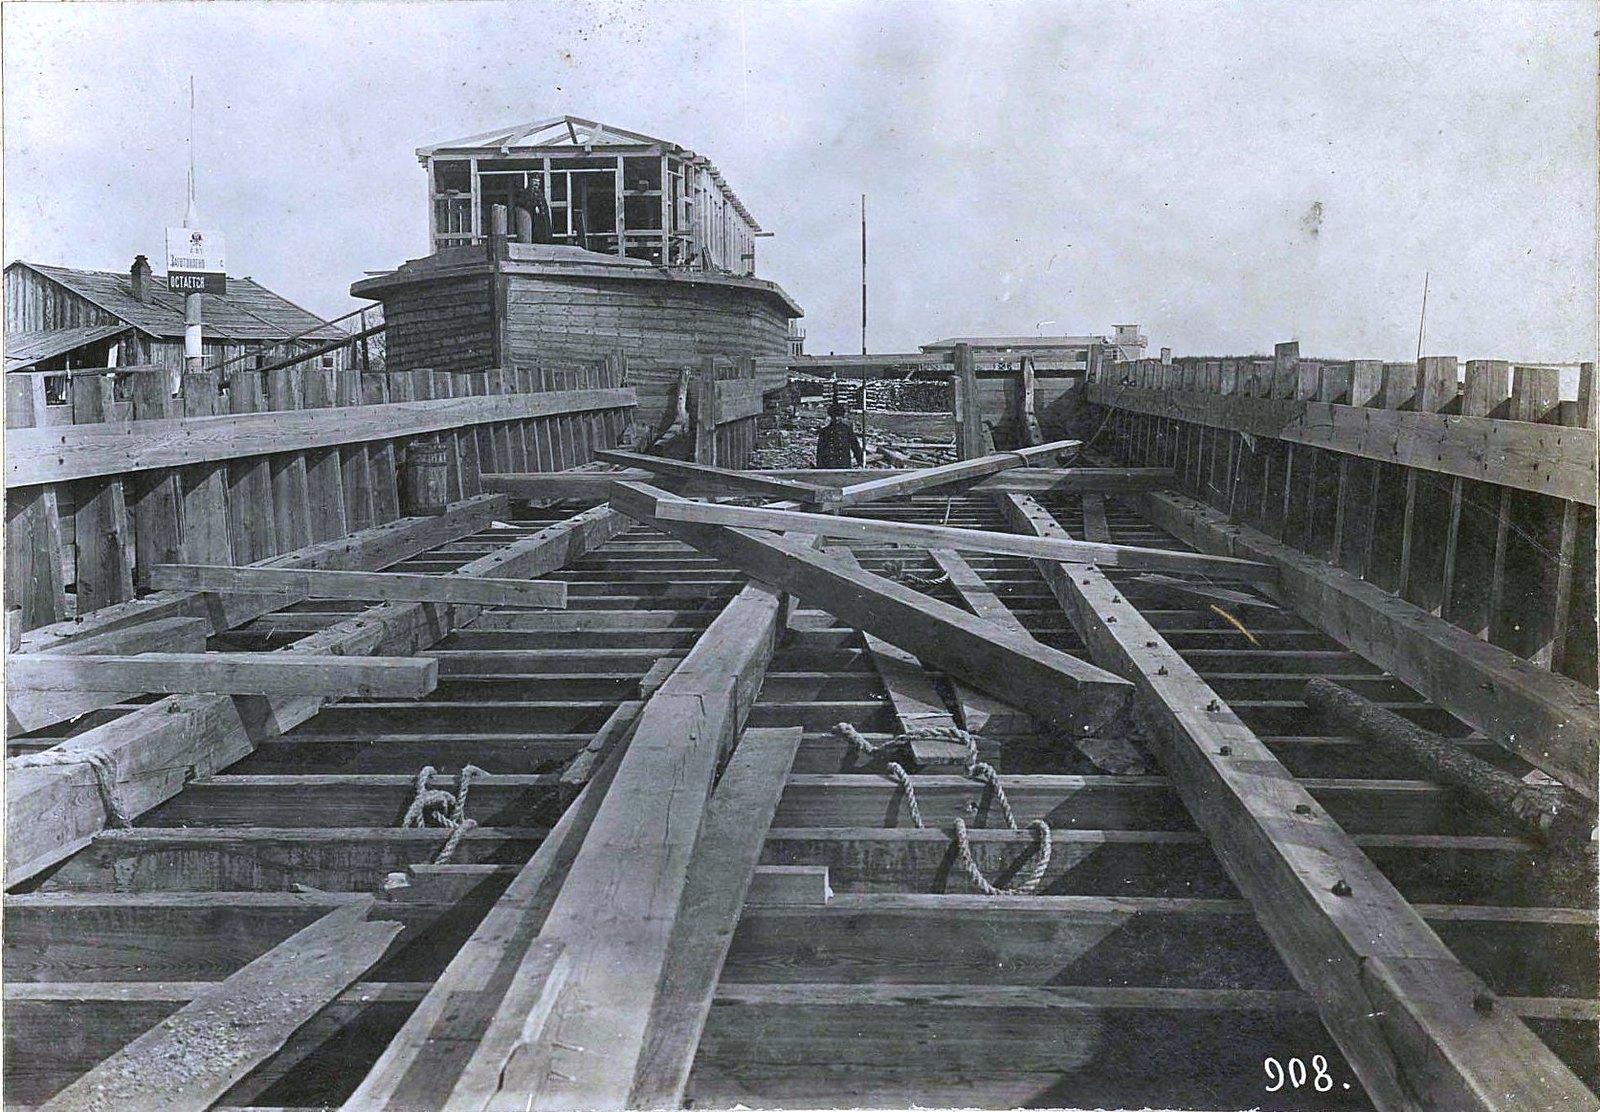 908. Крупный план части остова строящегося корабля